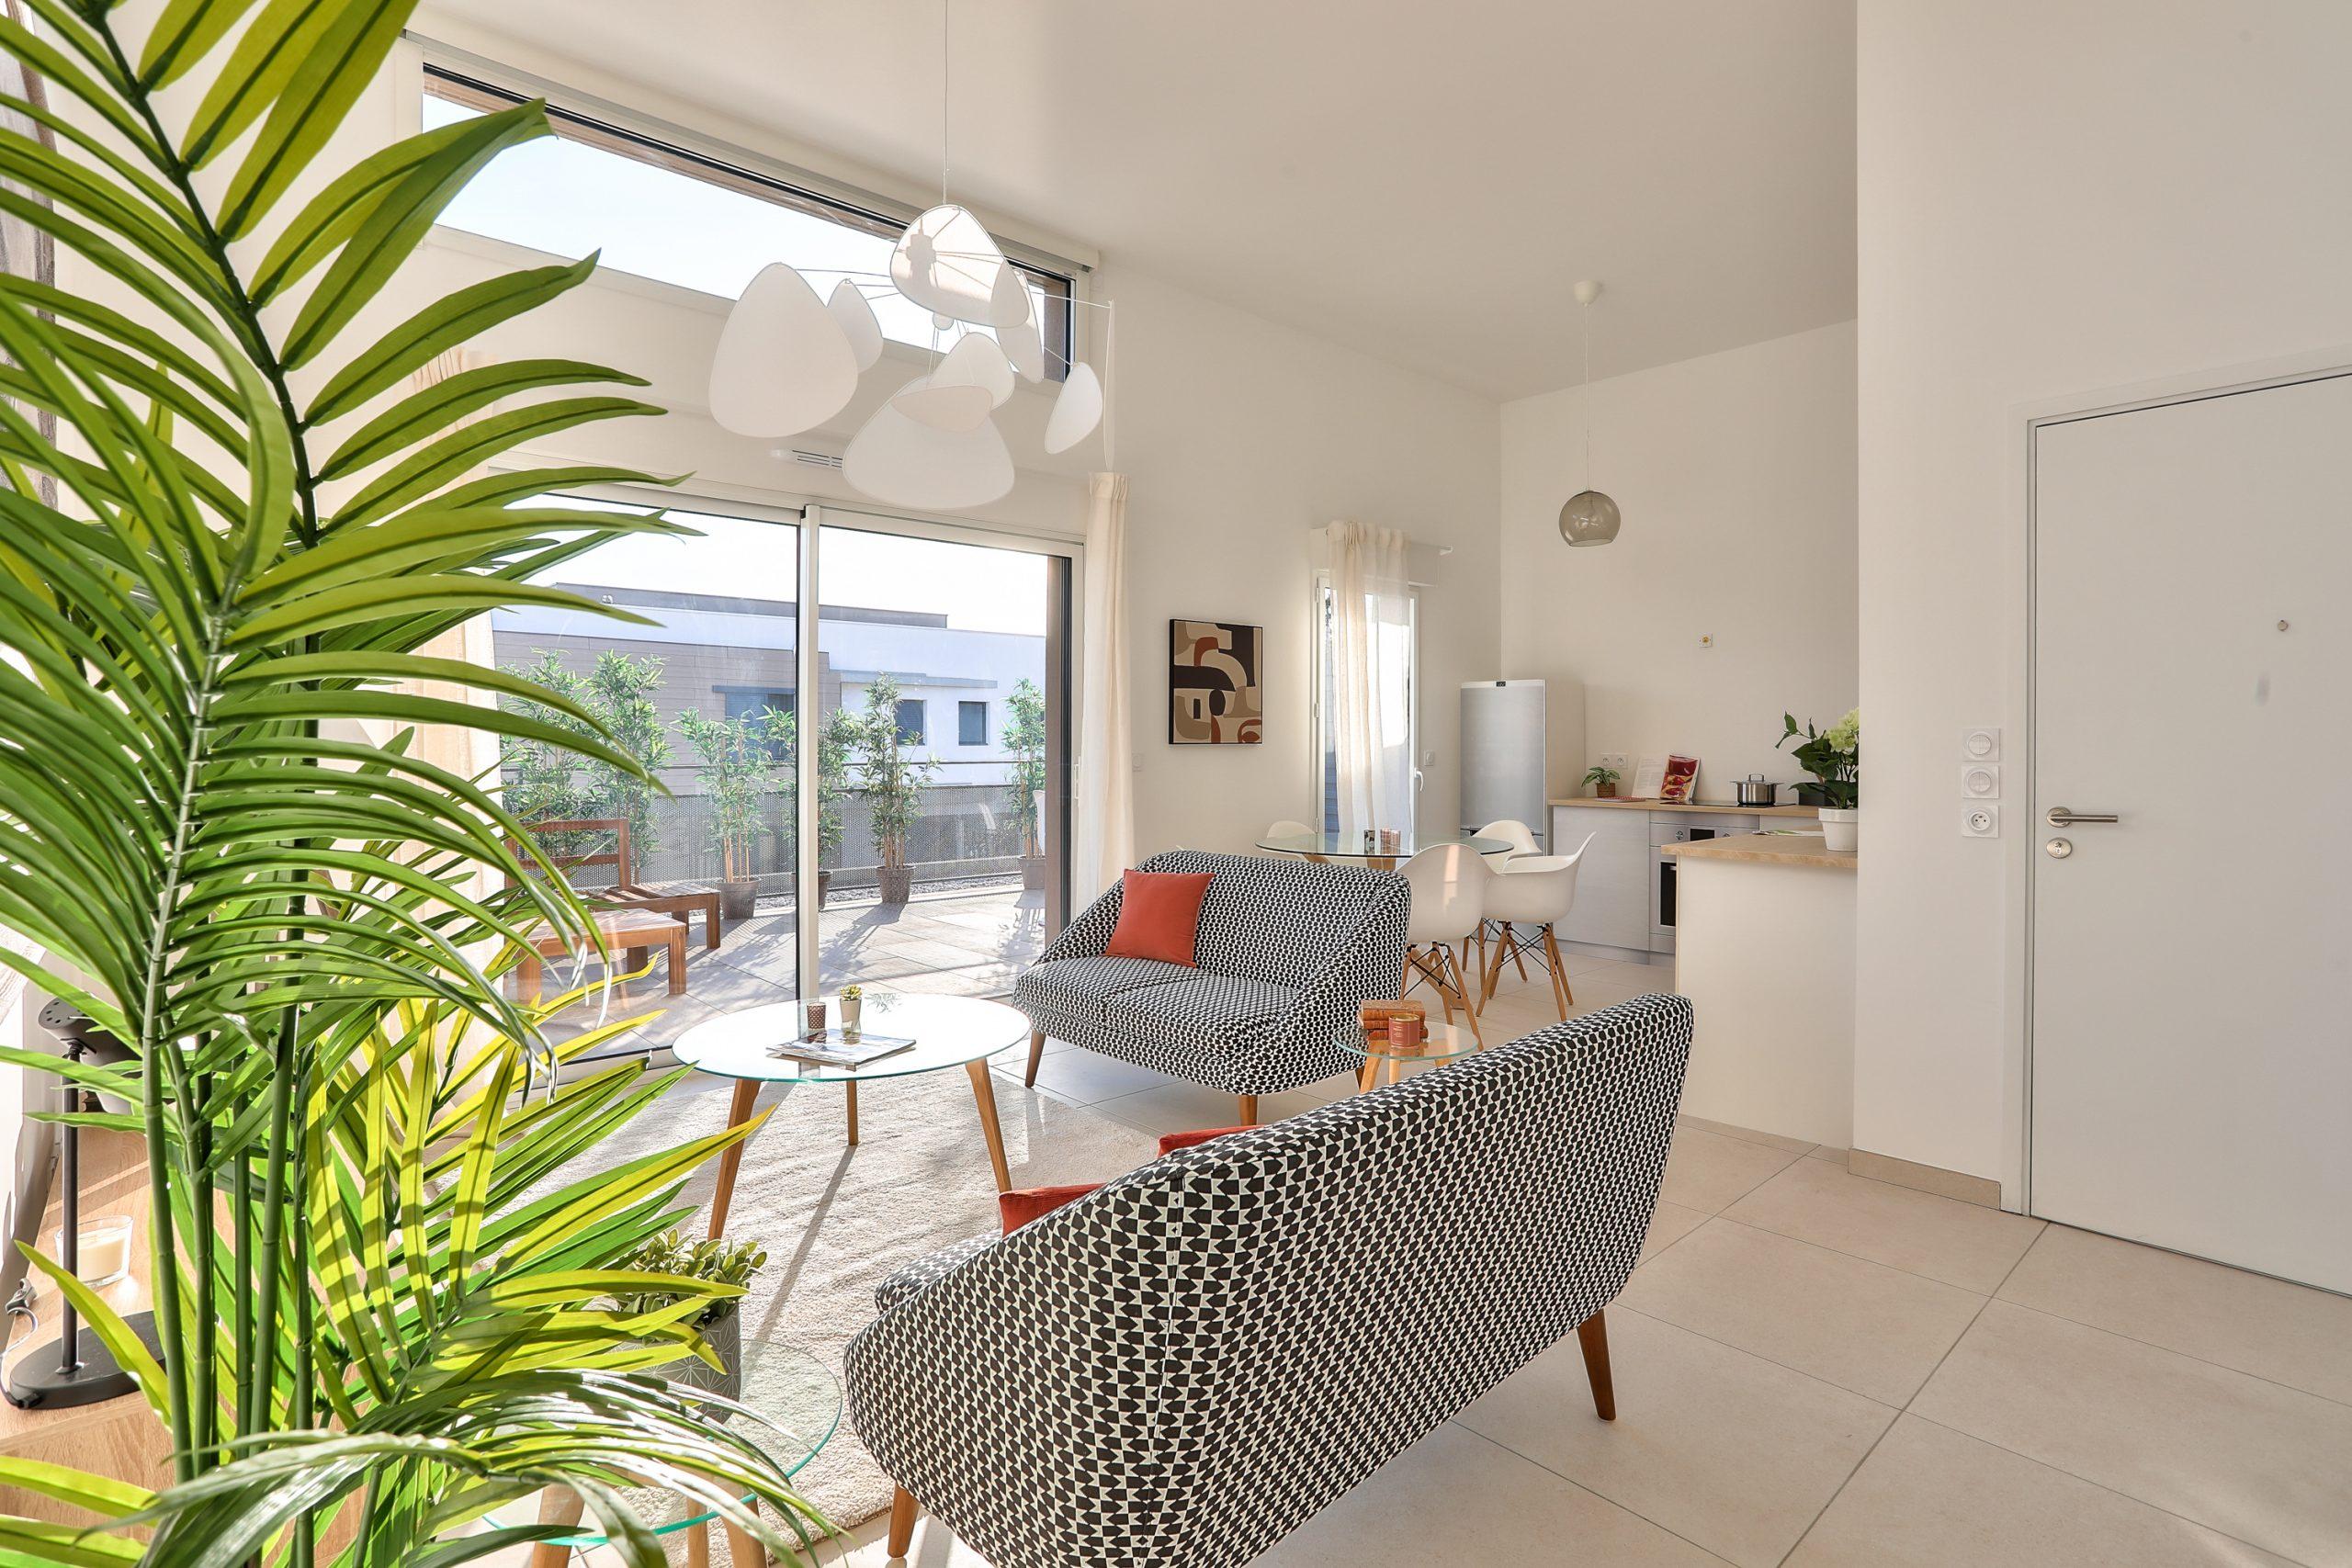 Villeneuve-Loubet – Rooftop terrace apartment of 4 Rooms in luxury residence